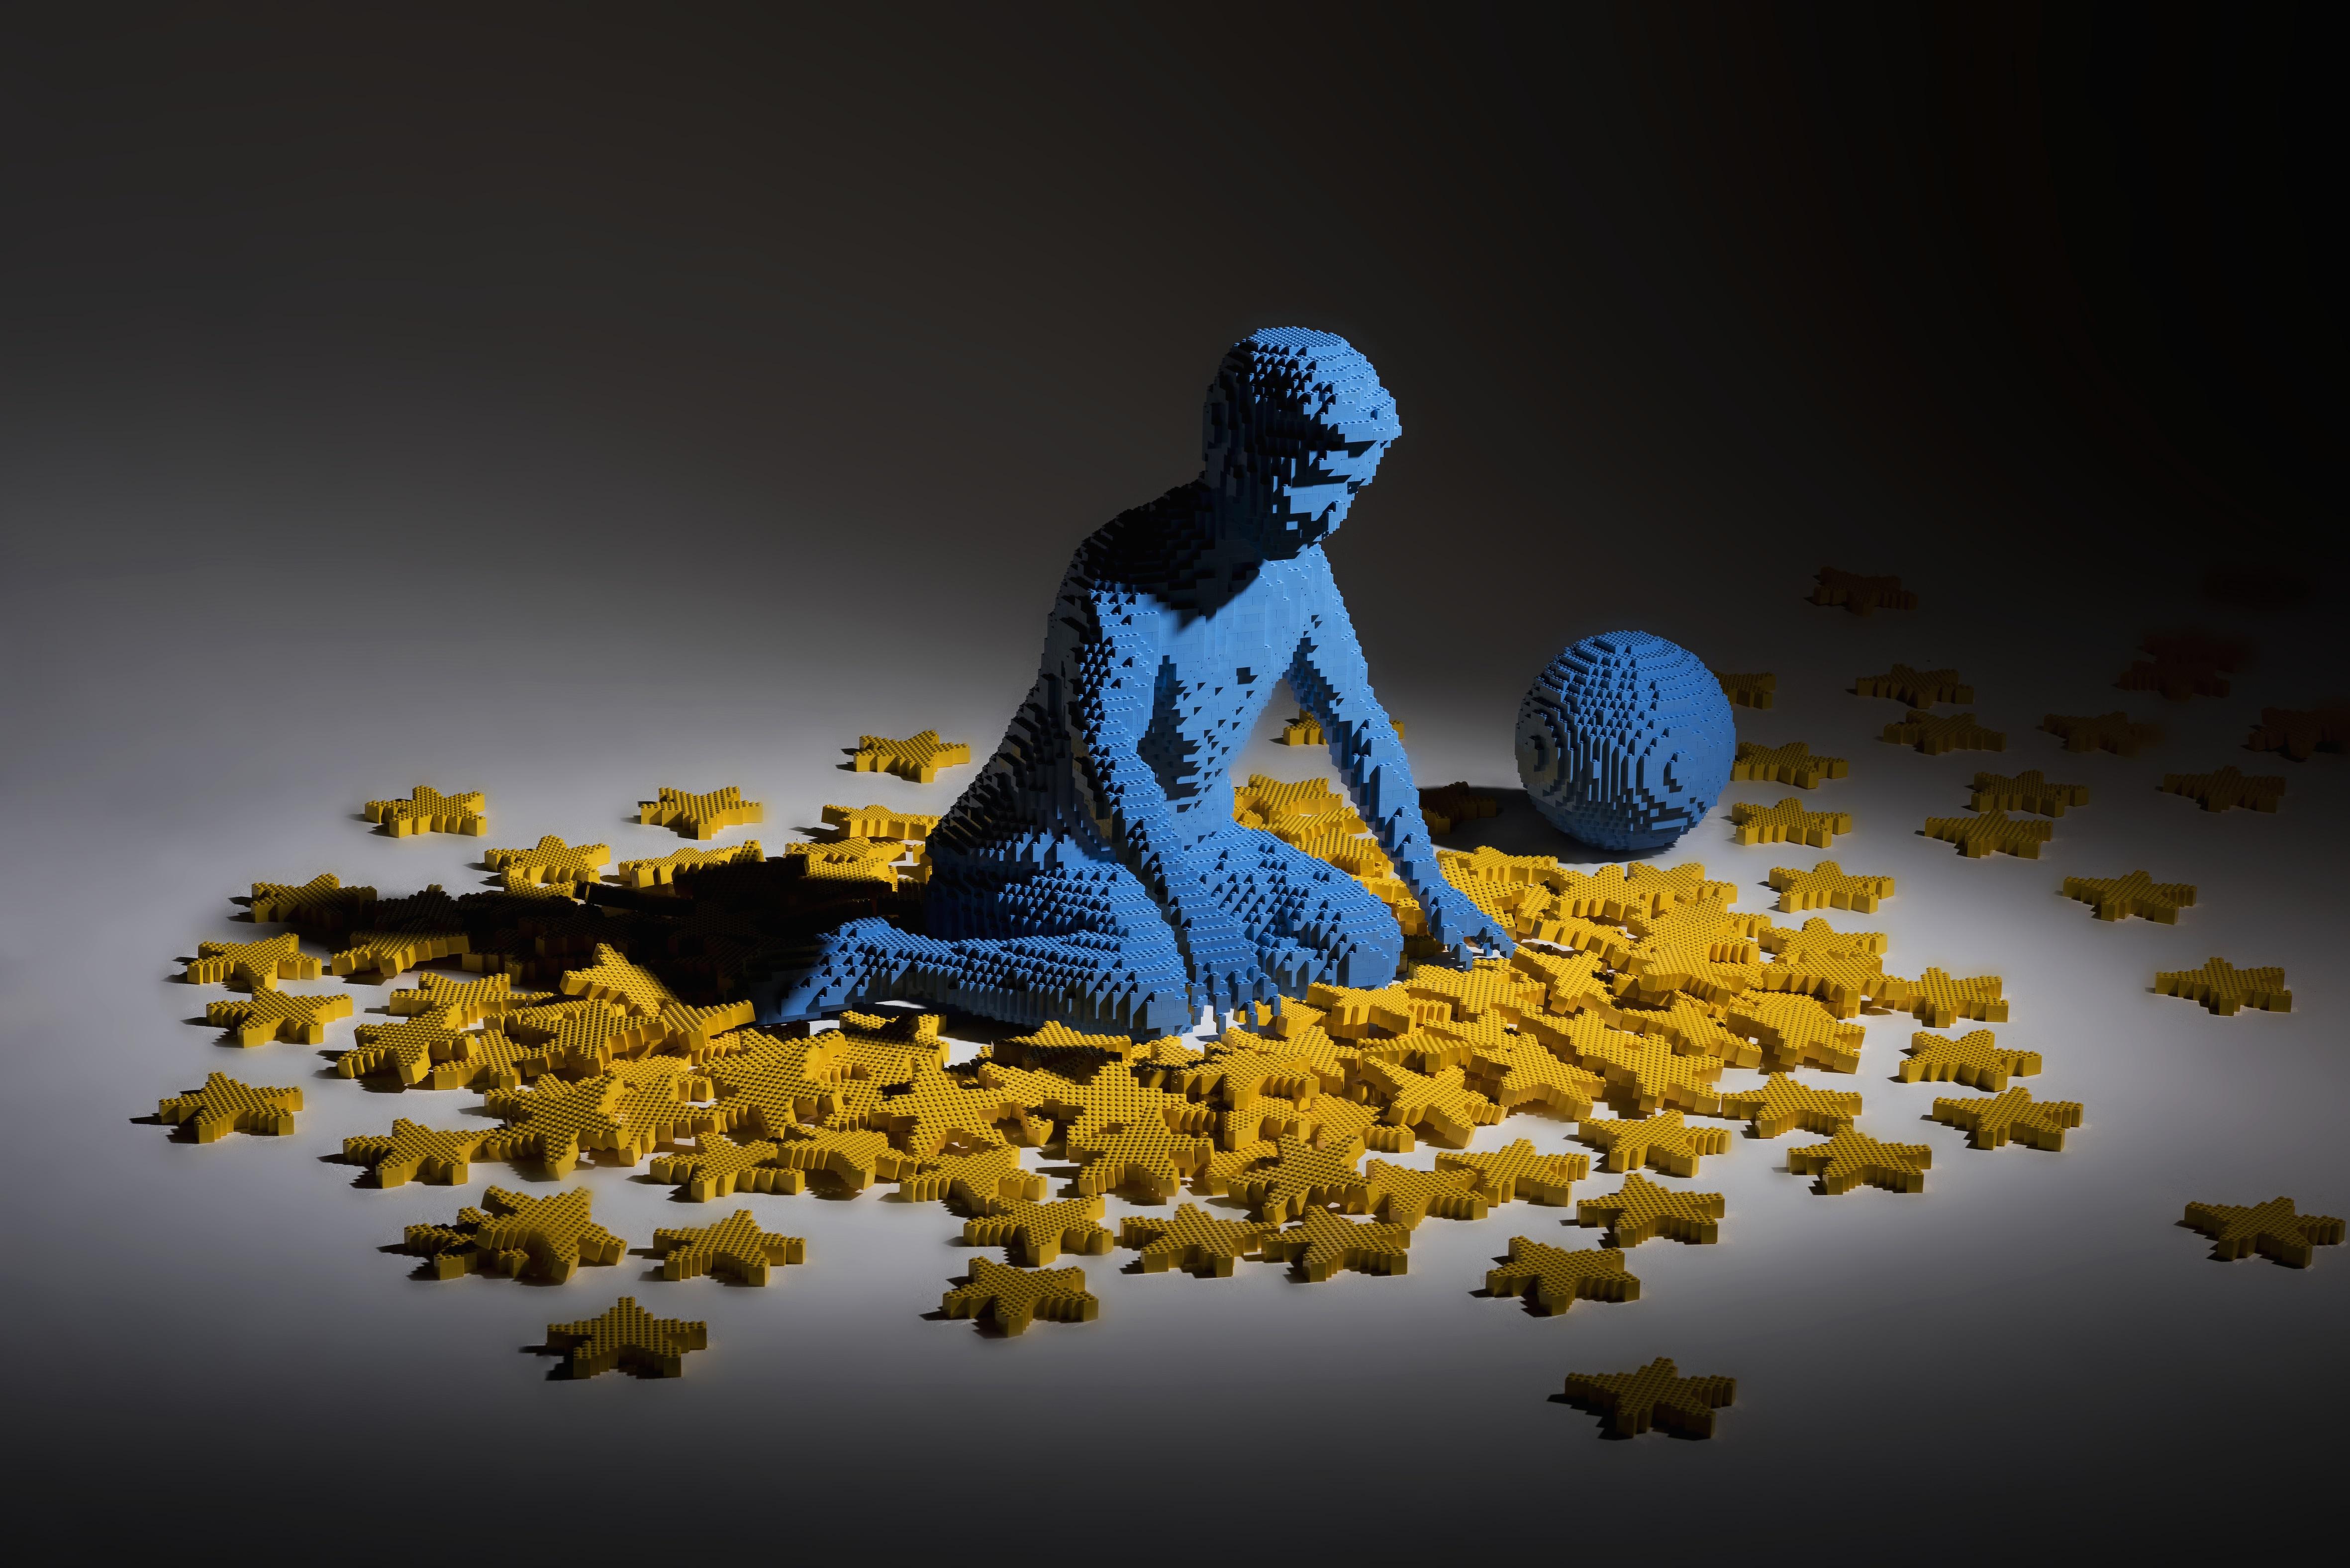 mostra-lego-milano-chiedilo-alle-stelle